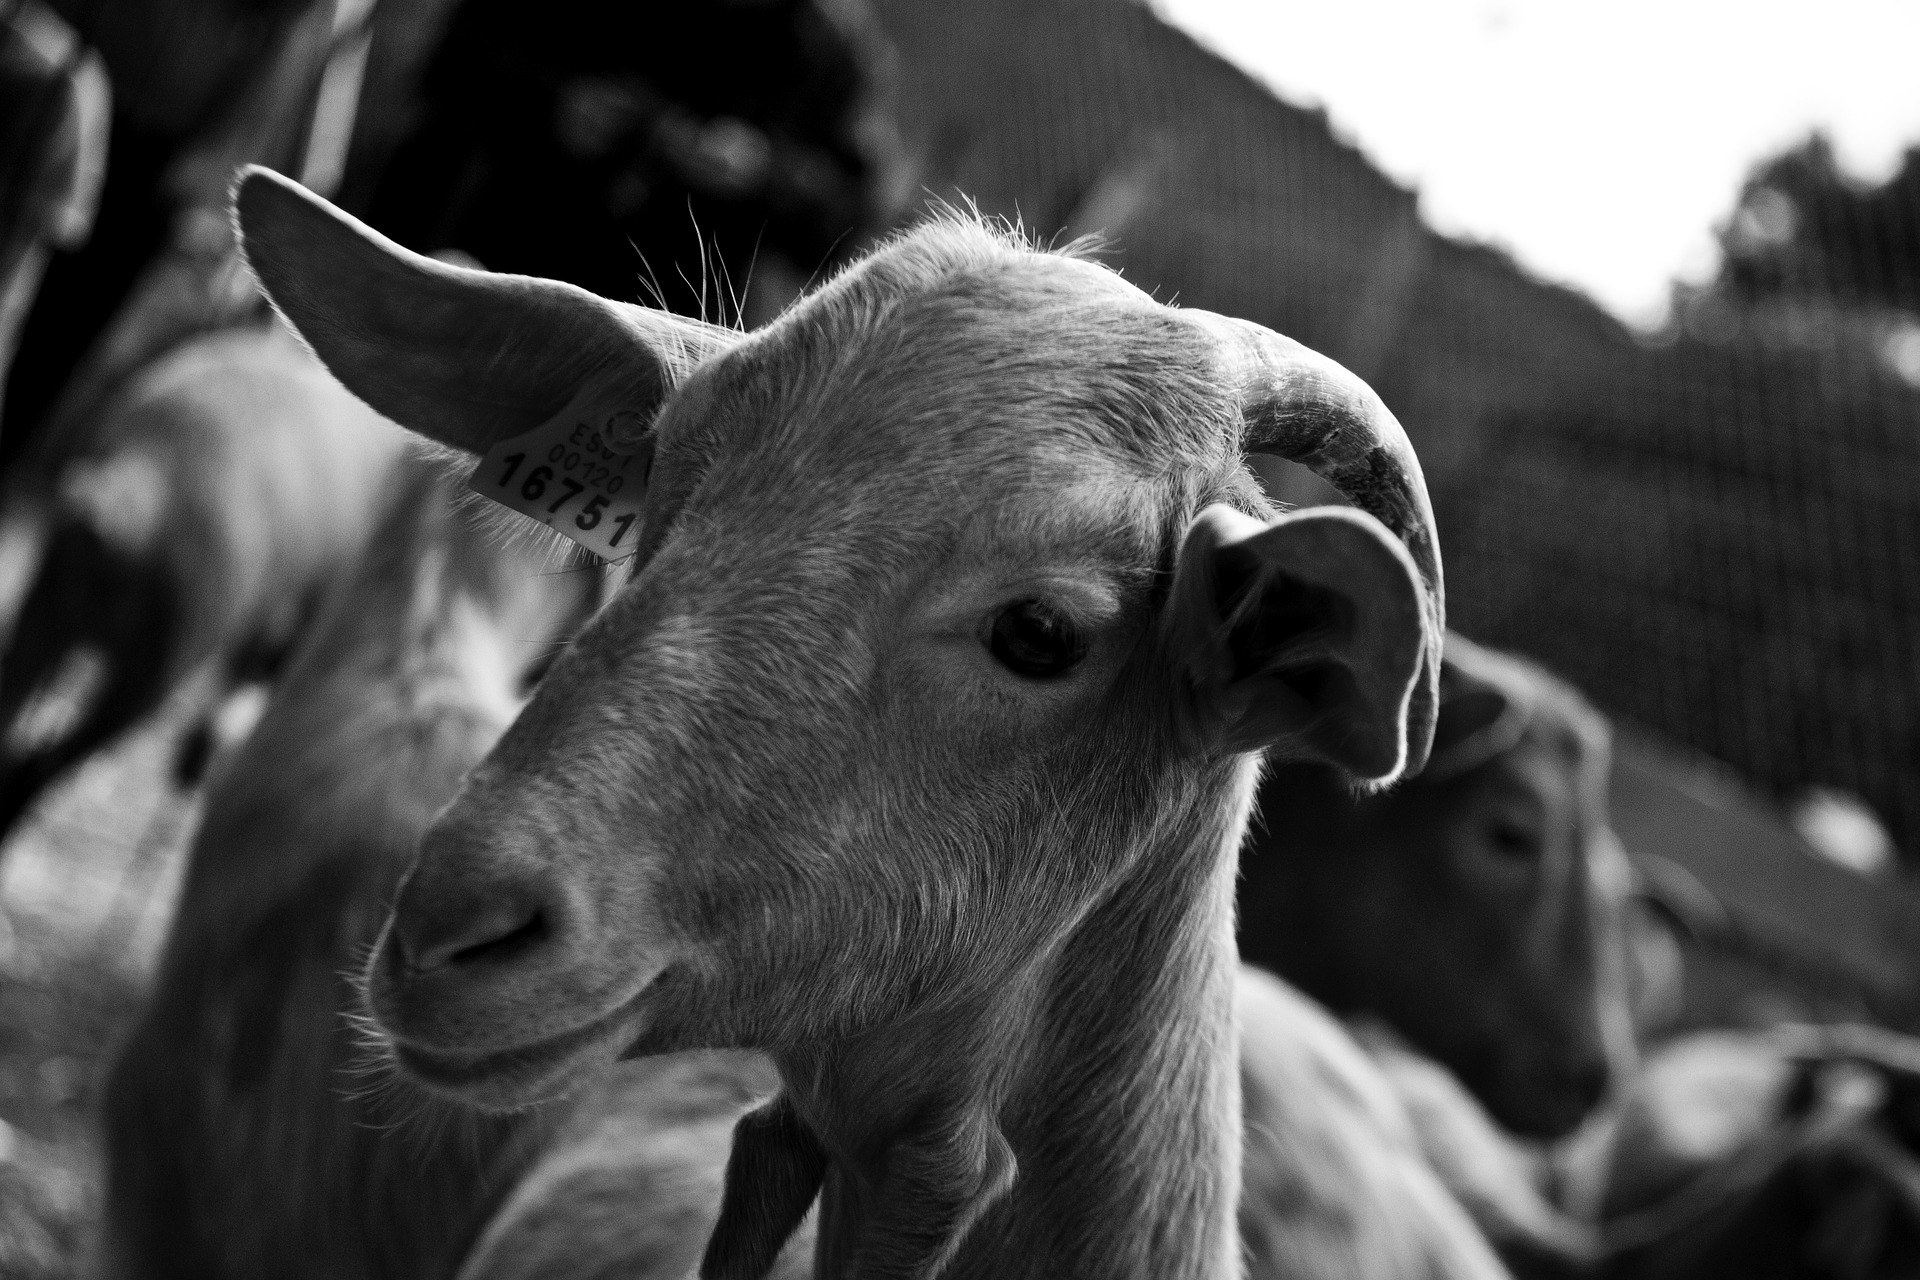 goat-3270268_1920